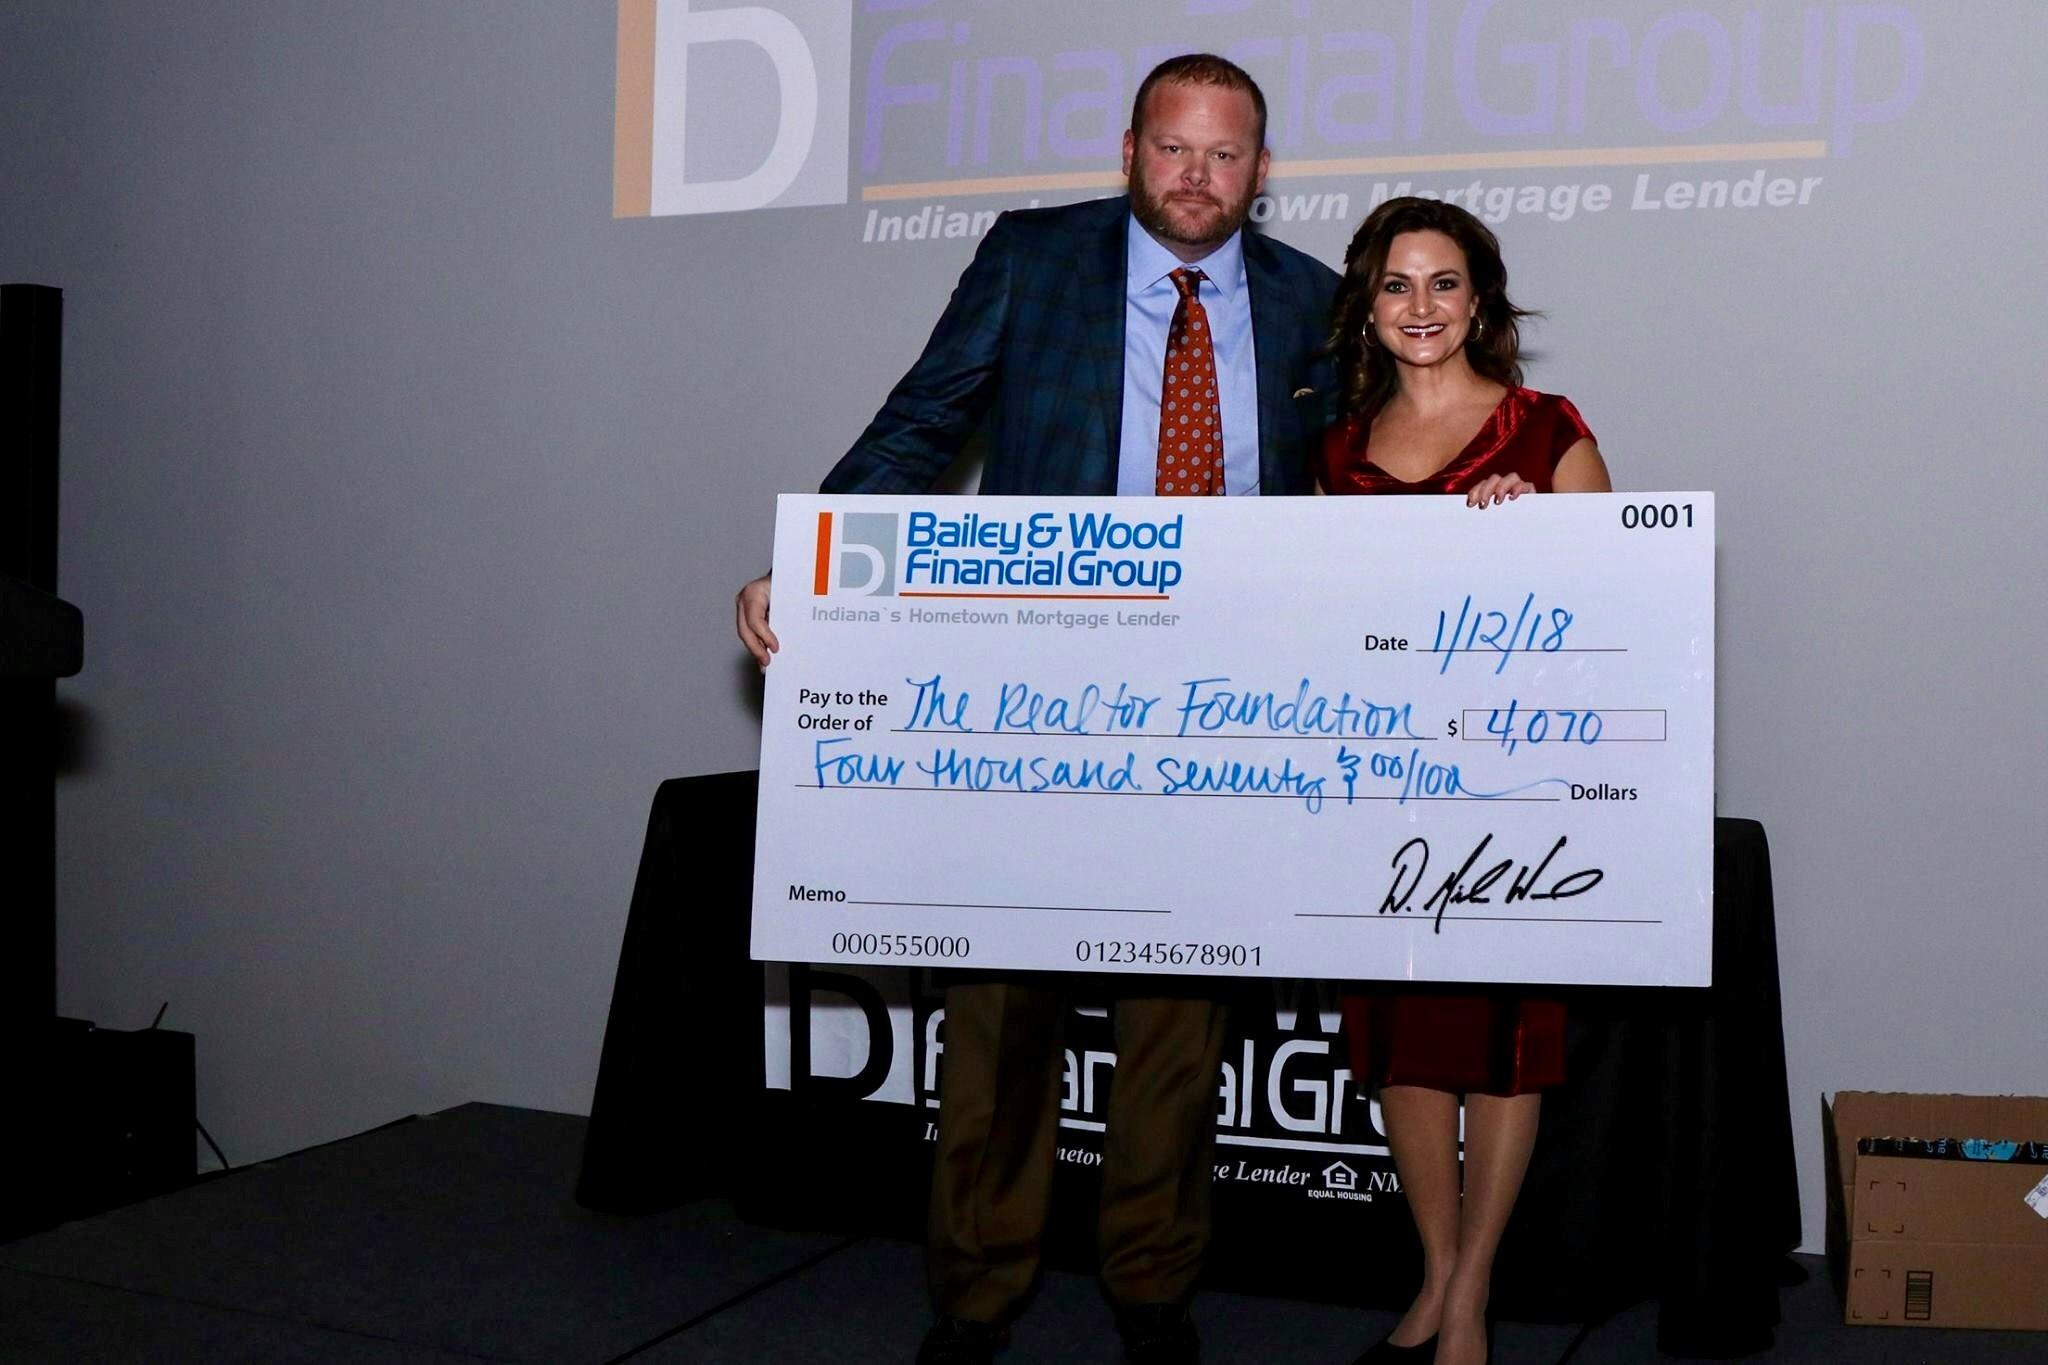 Mortgage Company Kick Starts 2018 Fundraising